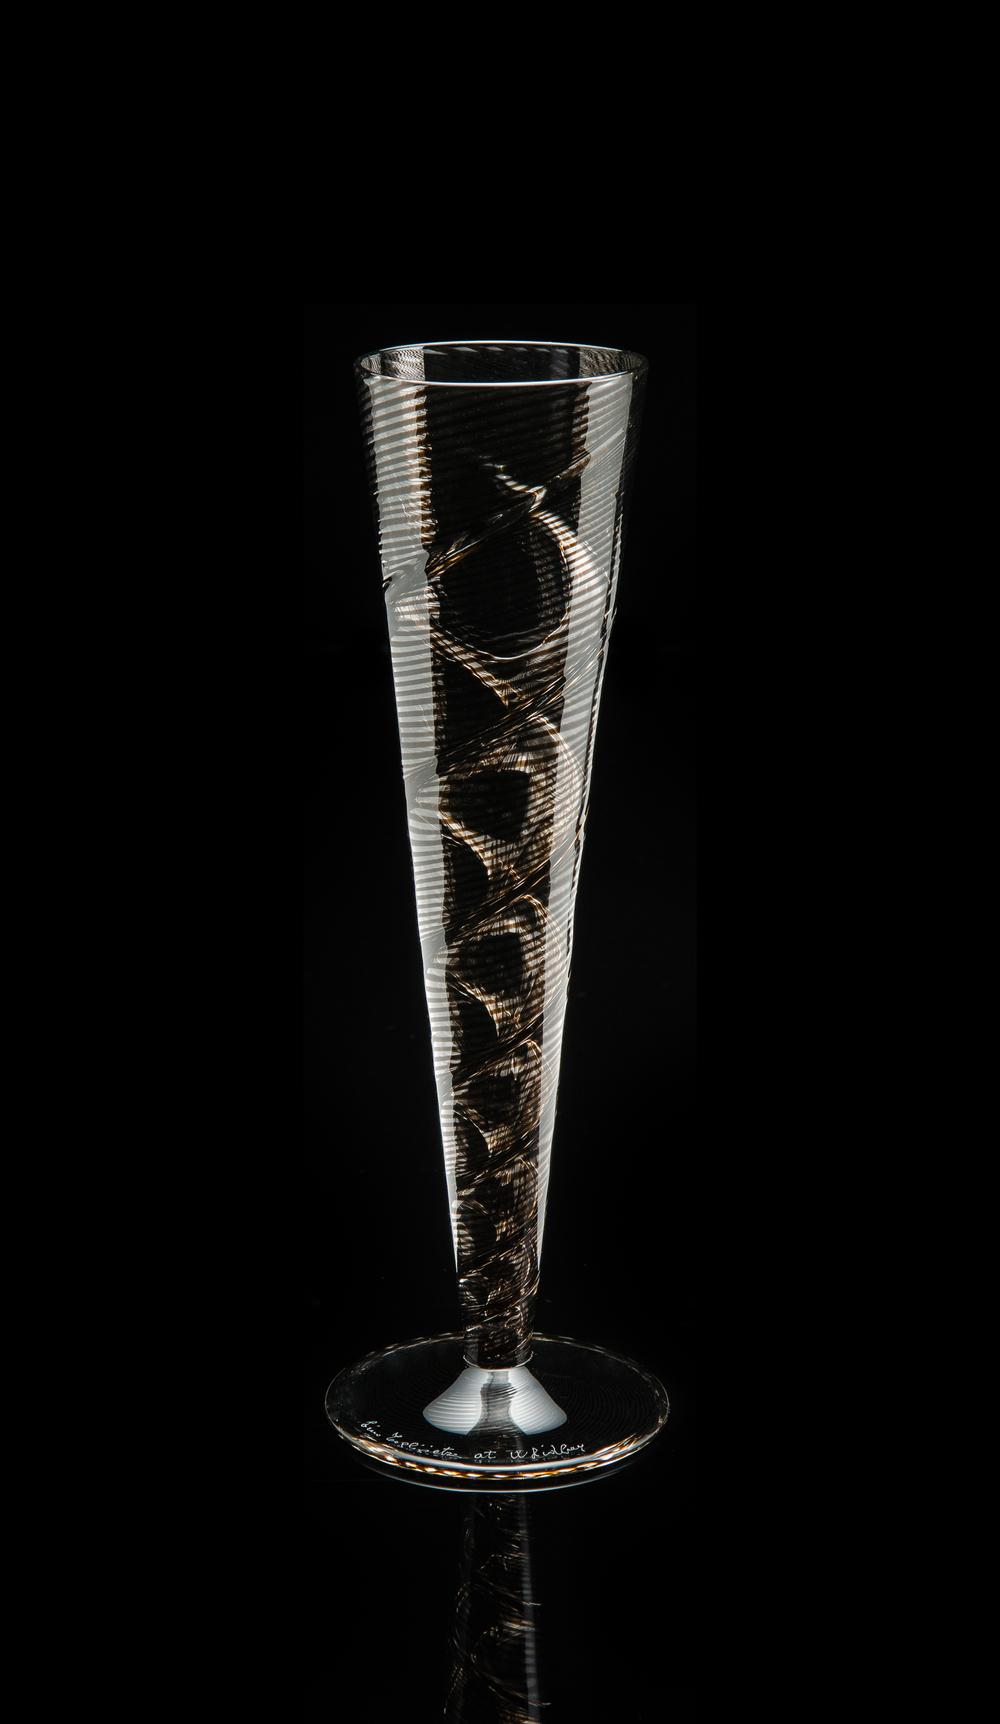 Lino Tagliapietra, Goblet (1991-1994, glass, 9 1/2 x 3 1/4 x 3 1/4inches), LT.71